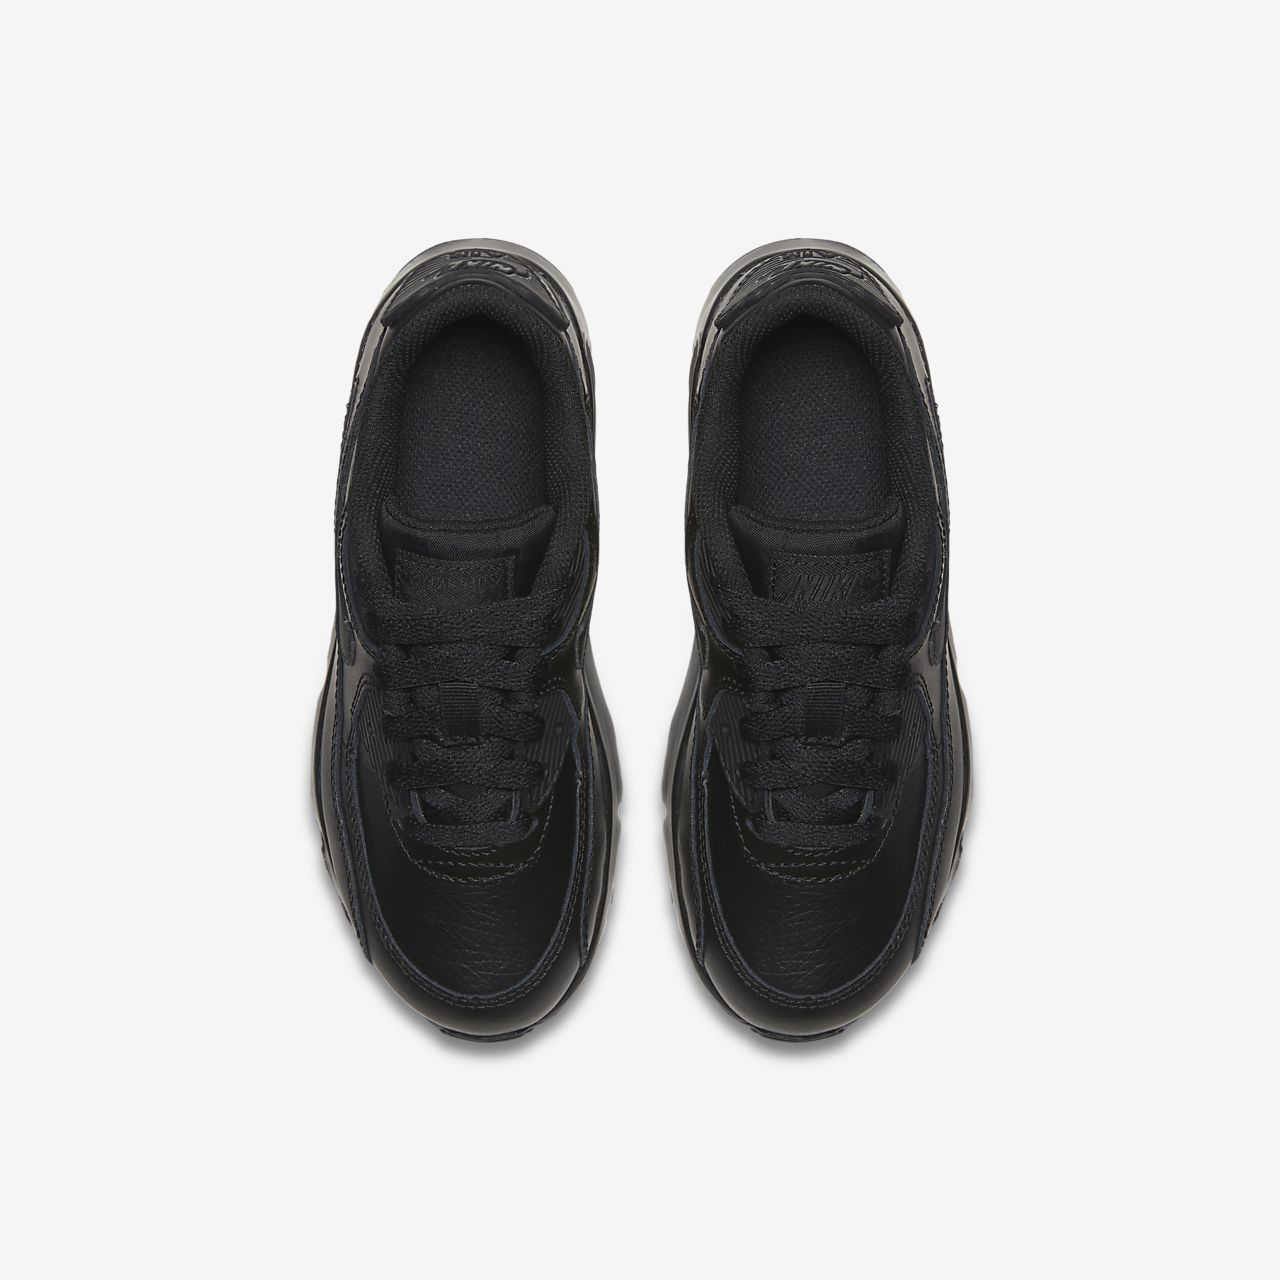 pretty nice 2bb7d a9fcd ... Chaussure Nike Air Max 90 Leather pour Jeune enfant